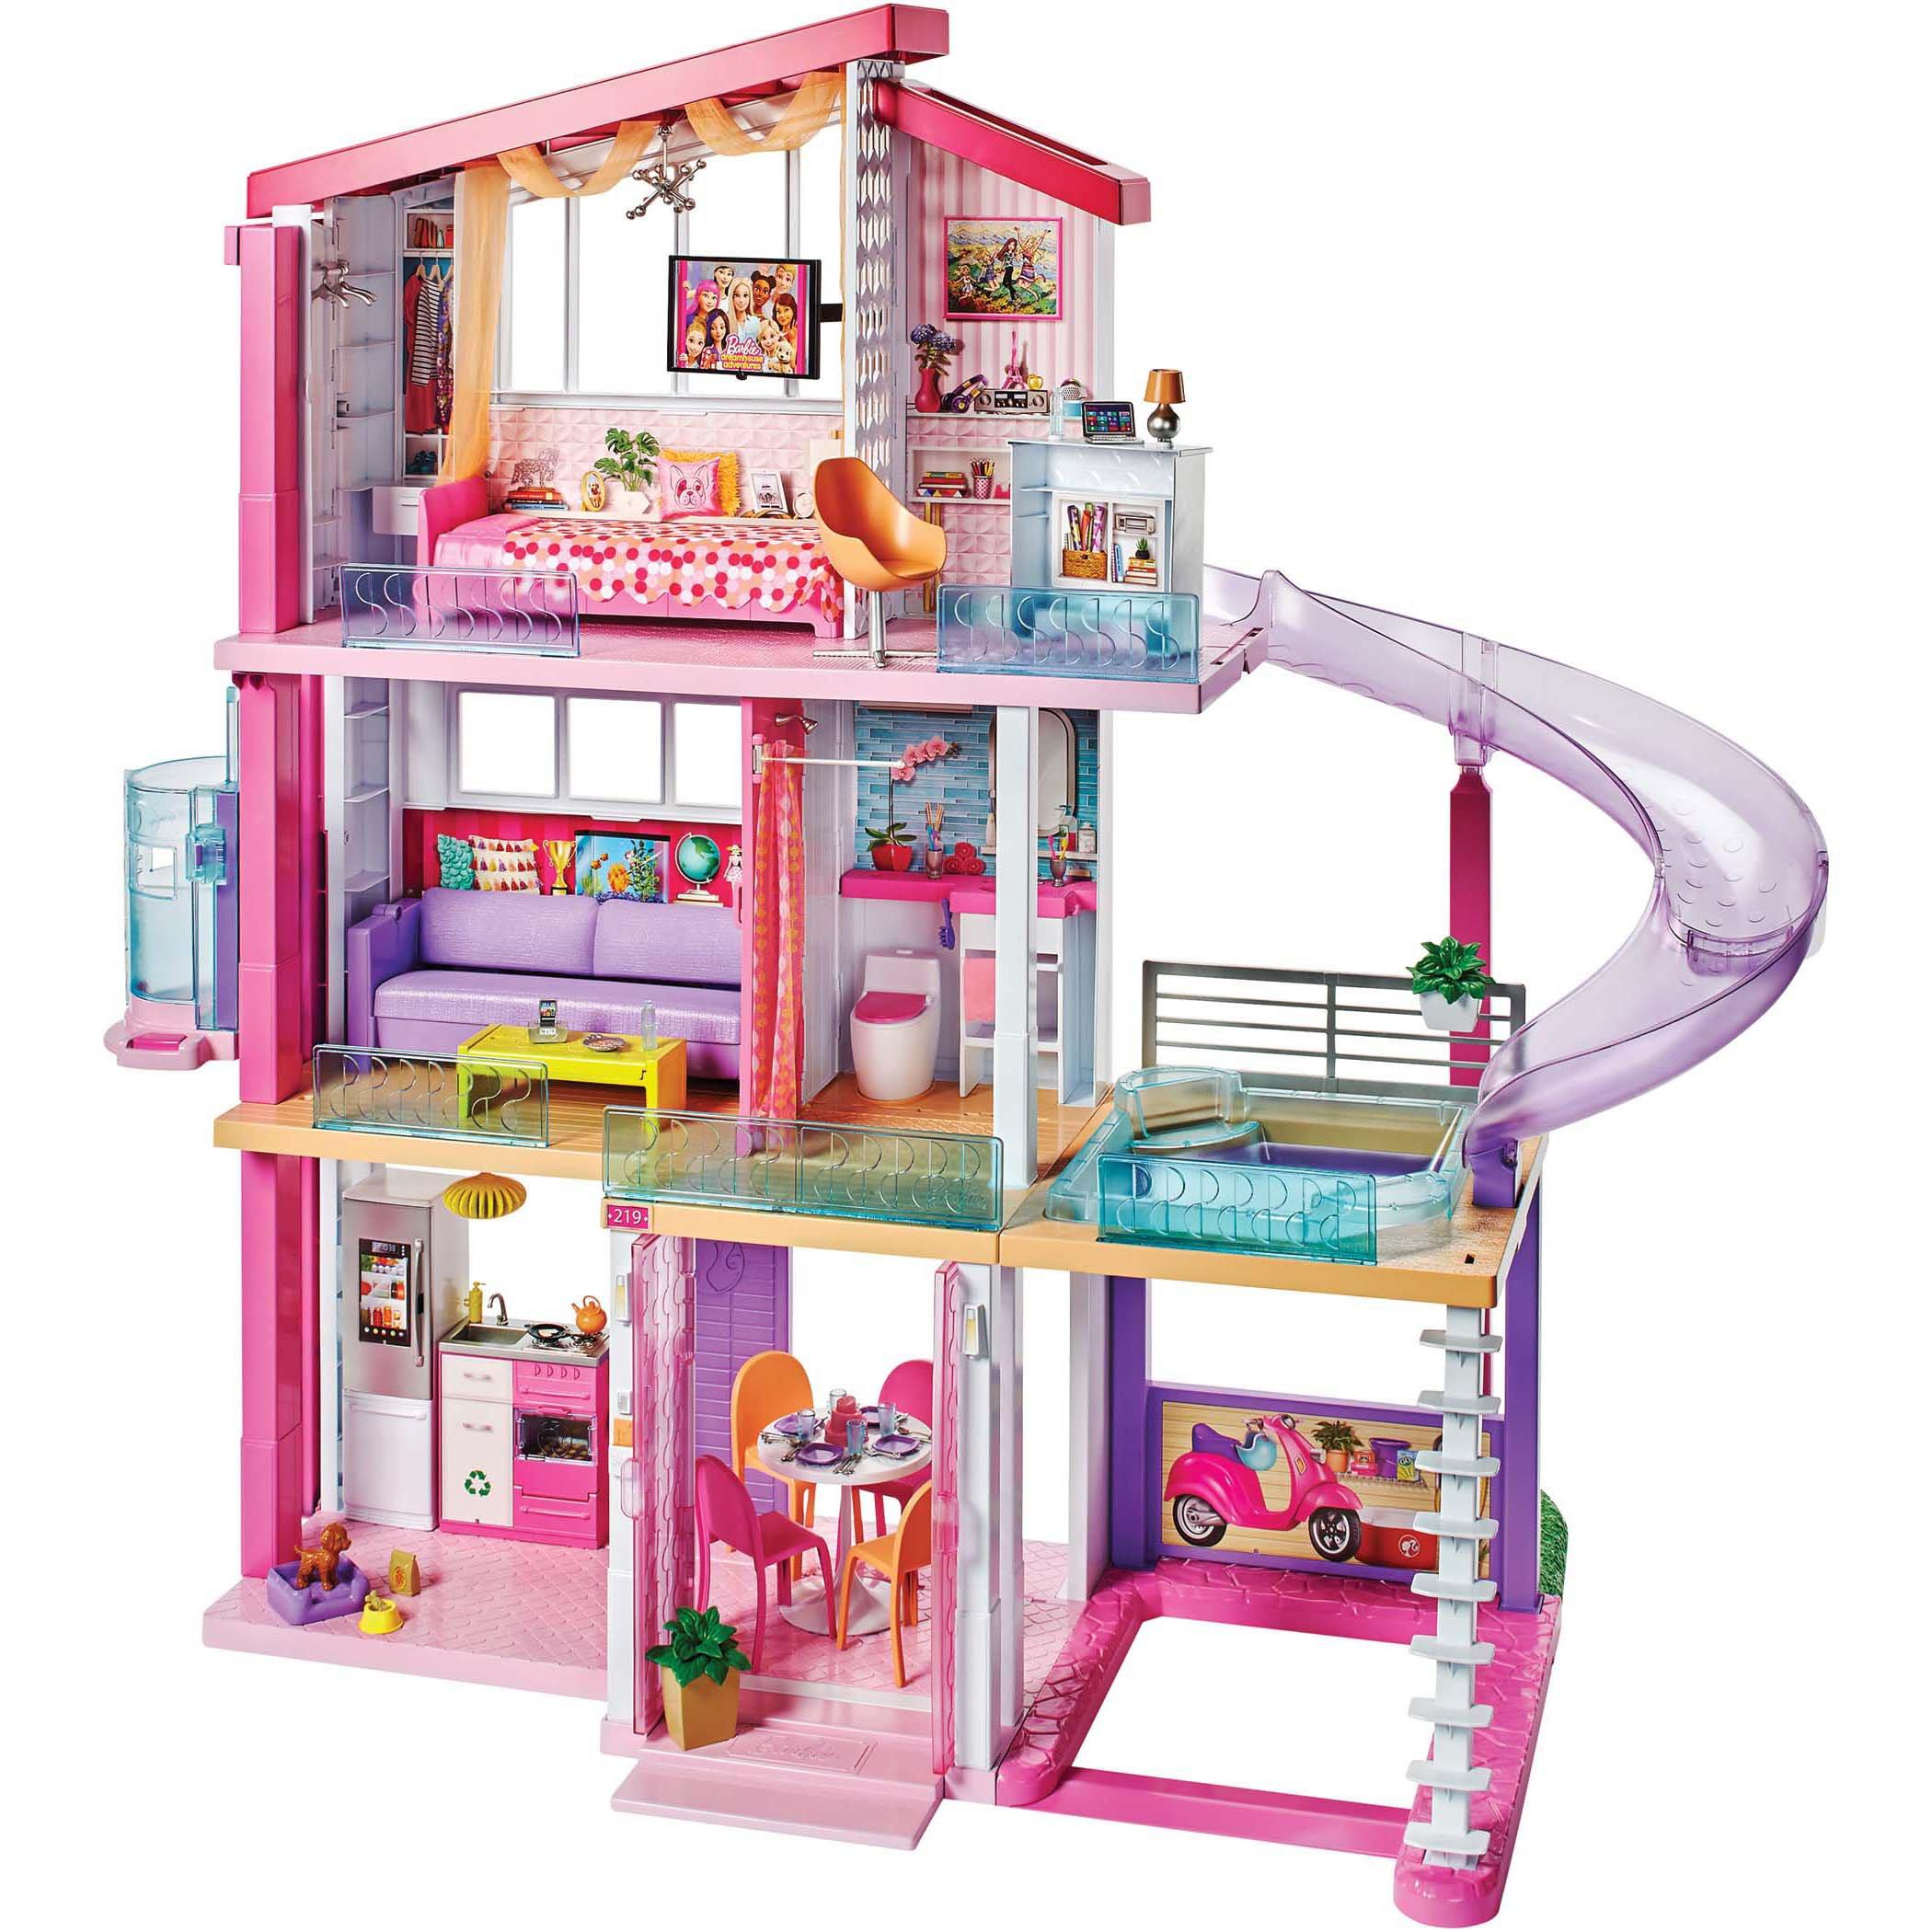 Mattel Barbie Dream House Dollhouse Shop Playsets At H E B